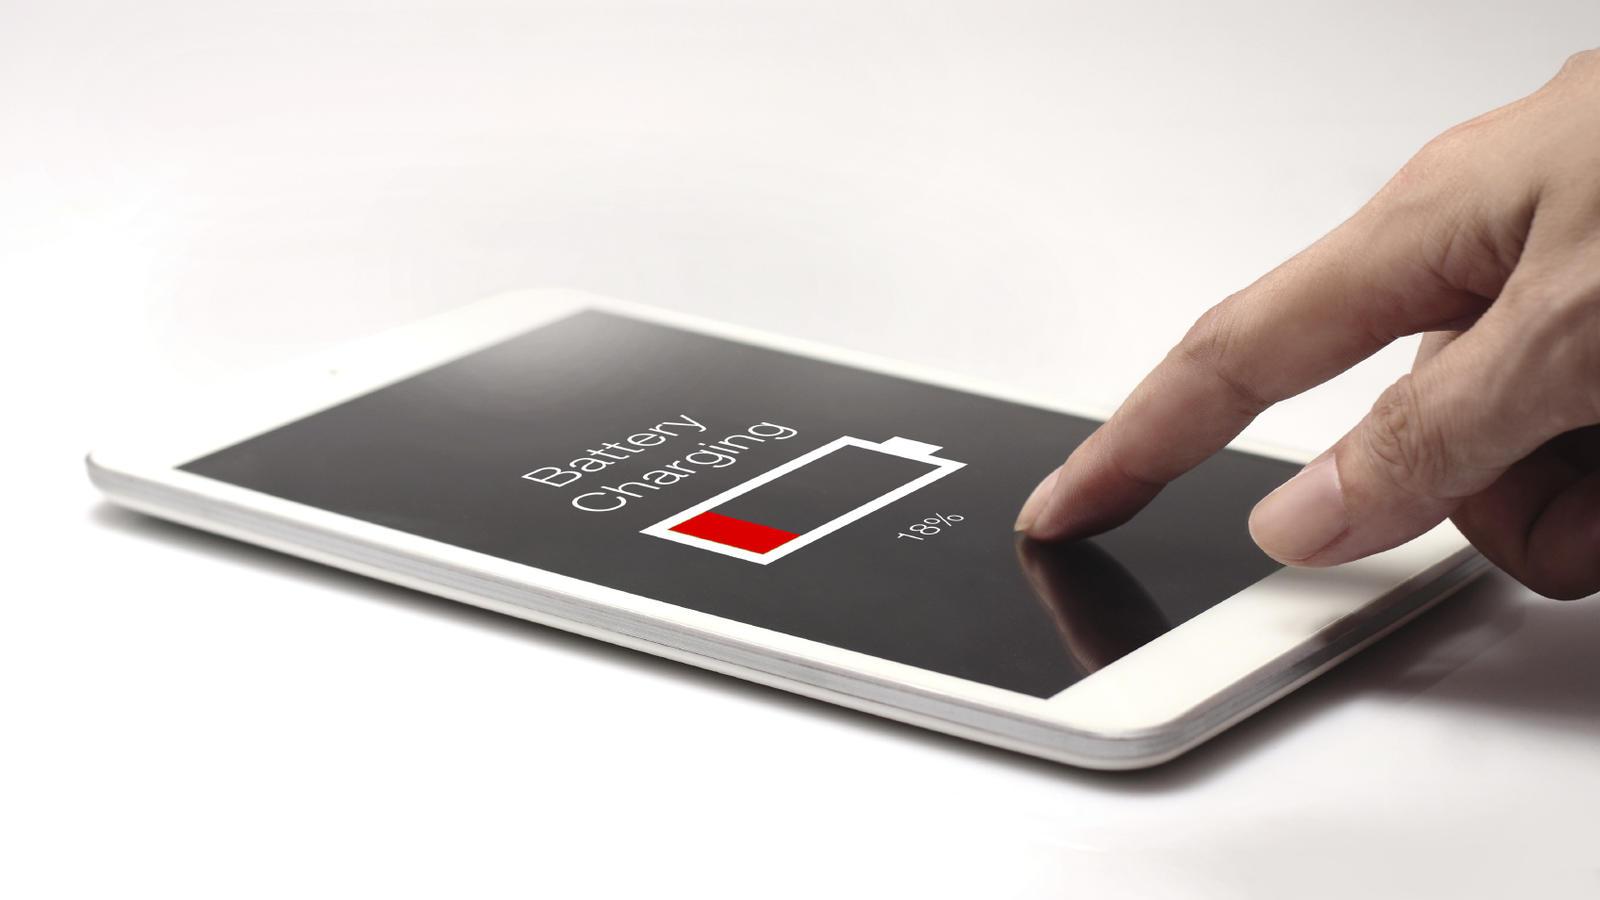 Akku Laden Smartphone